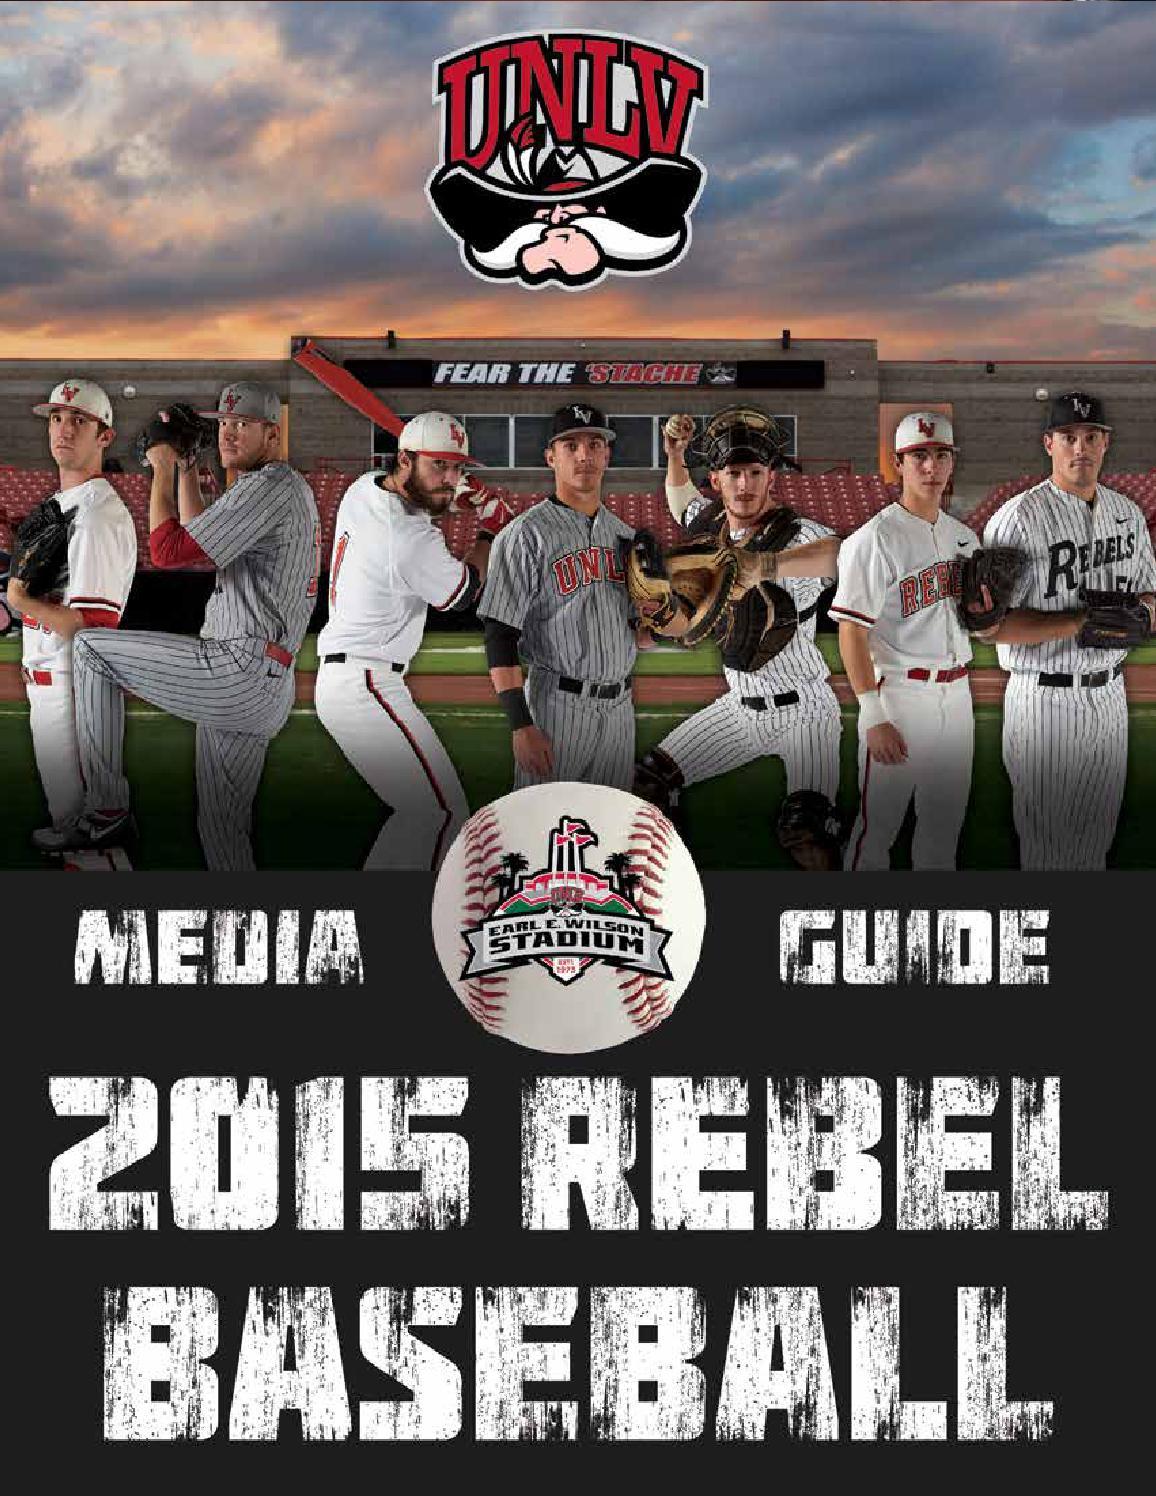 0fa7bf3aff7 2015 UNLV Baseball Media Guide by UNLV Sports Information - issuu